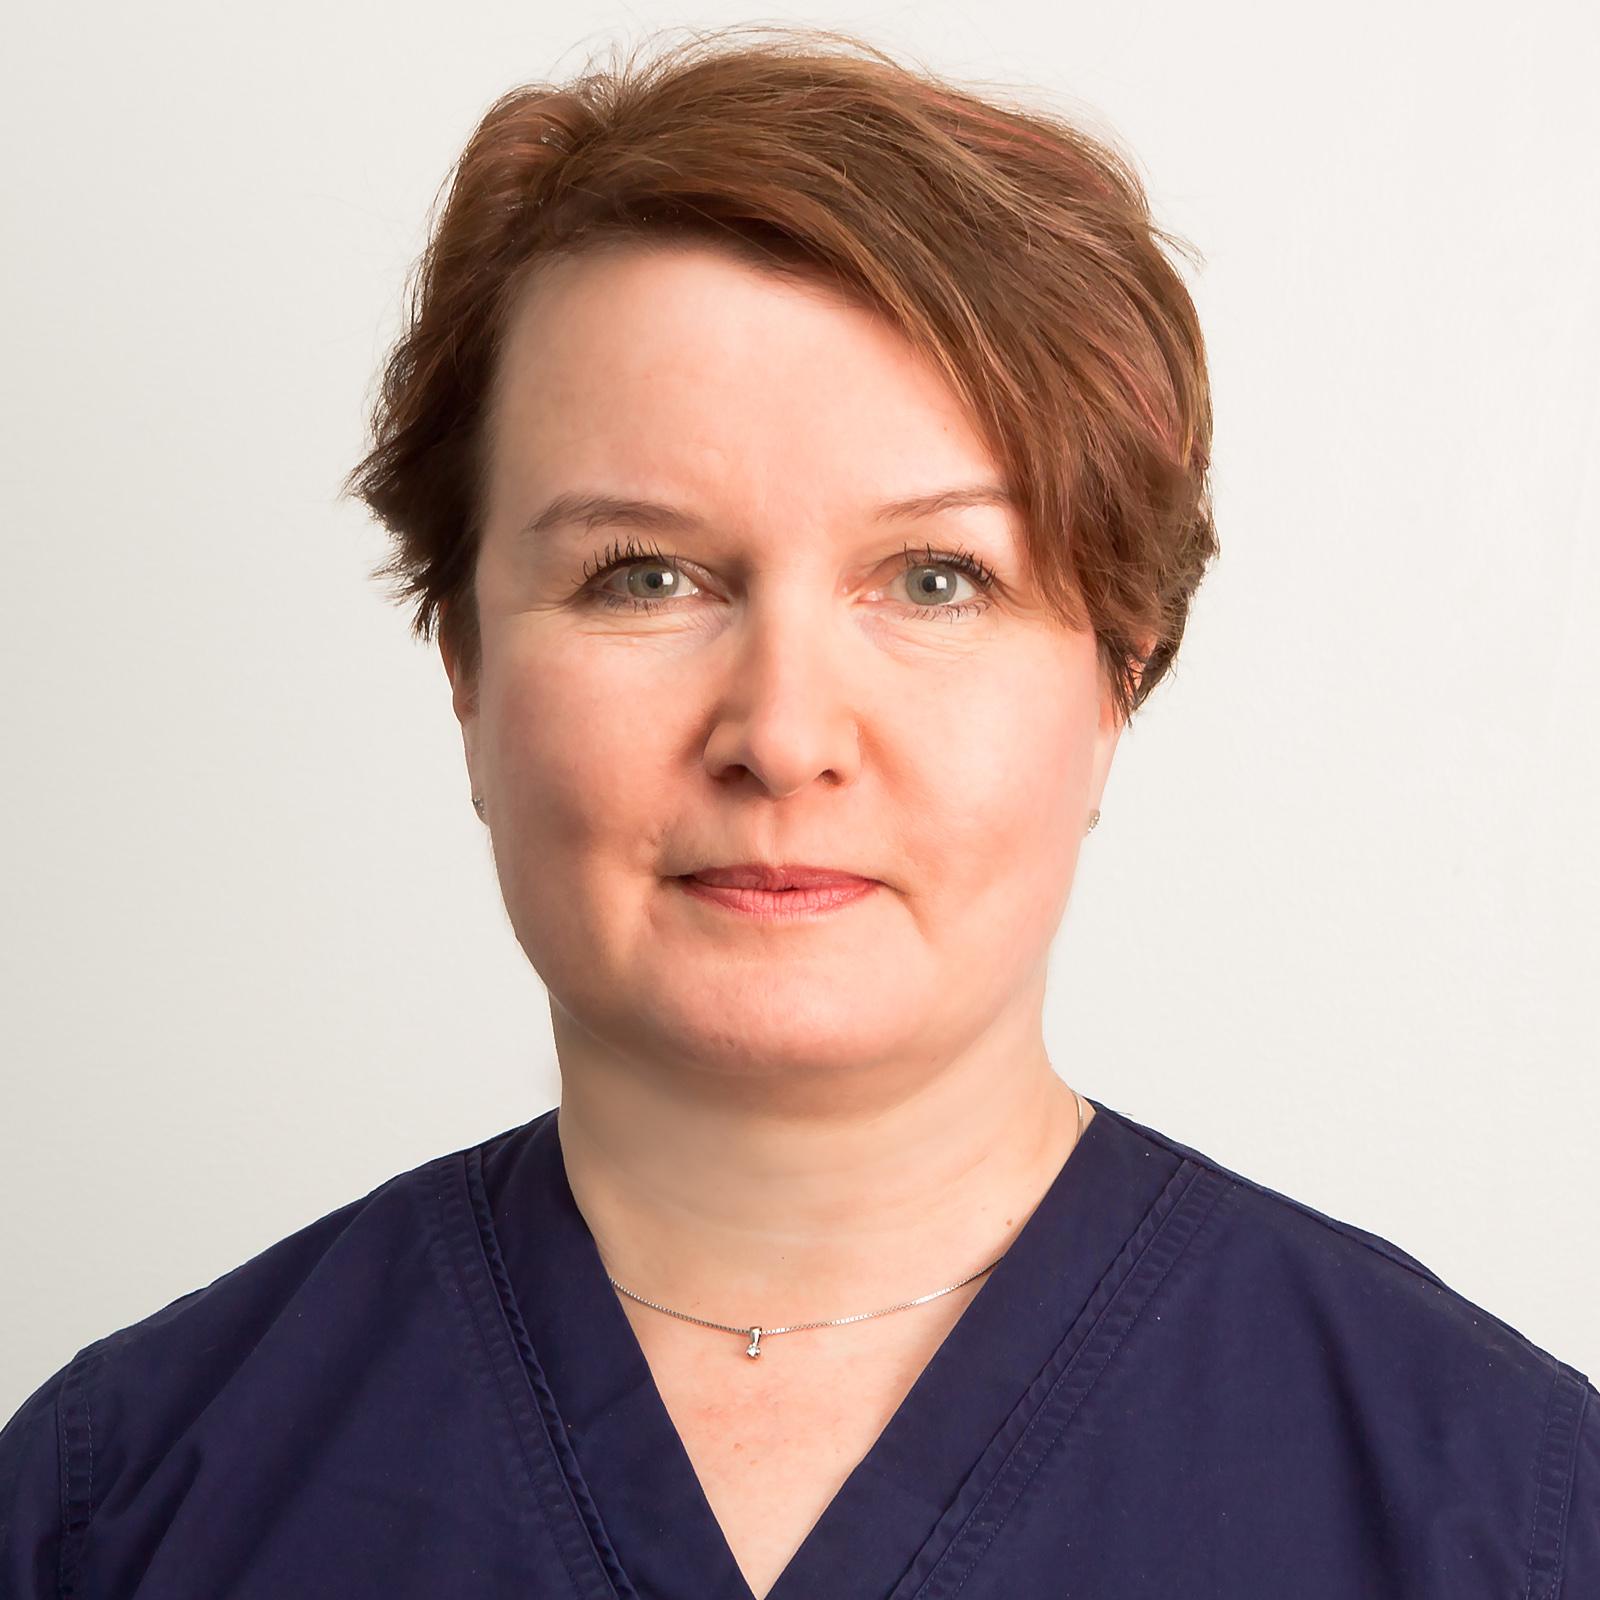 Pia Hörkkö